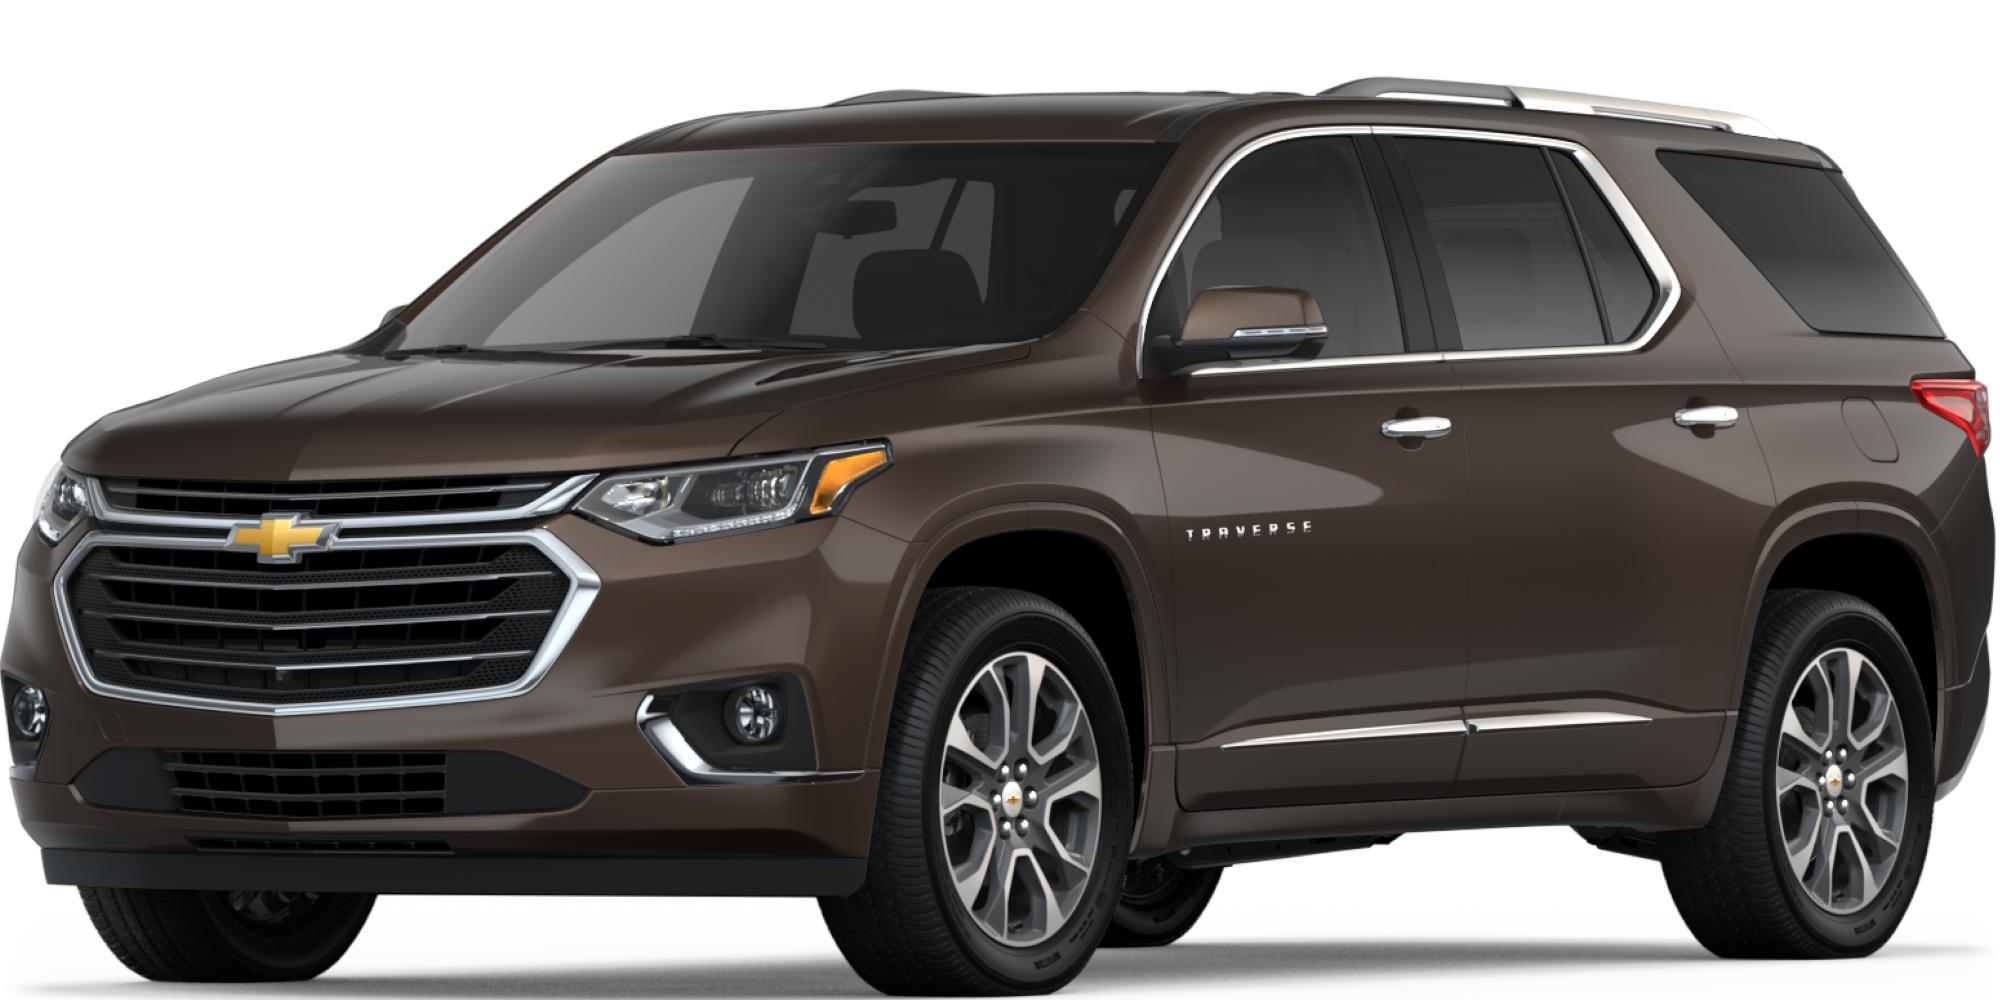 2018 Chevrolet Traverse for sale near Sacramento | John L ...